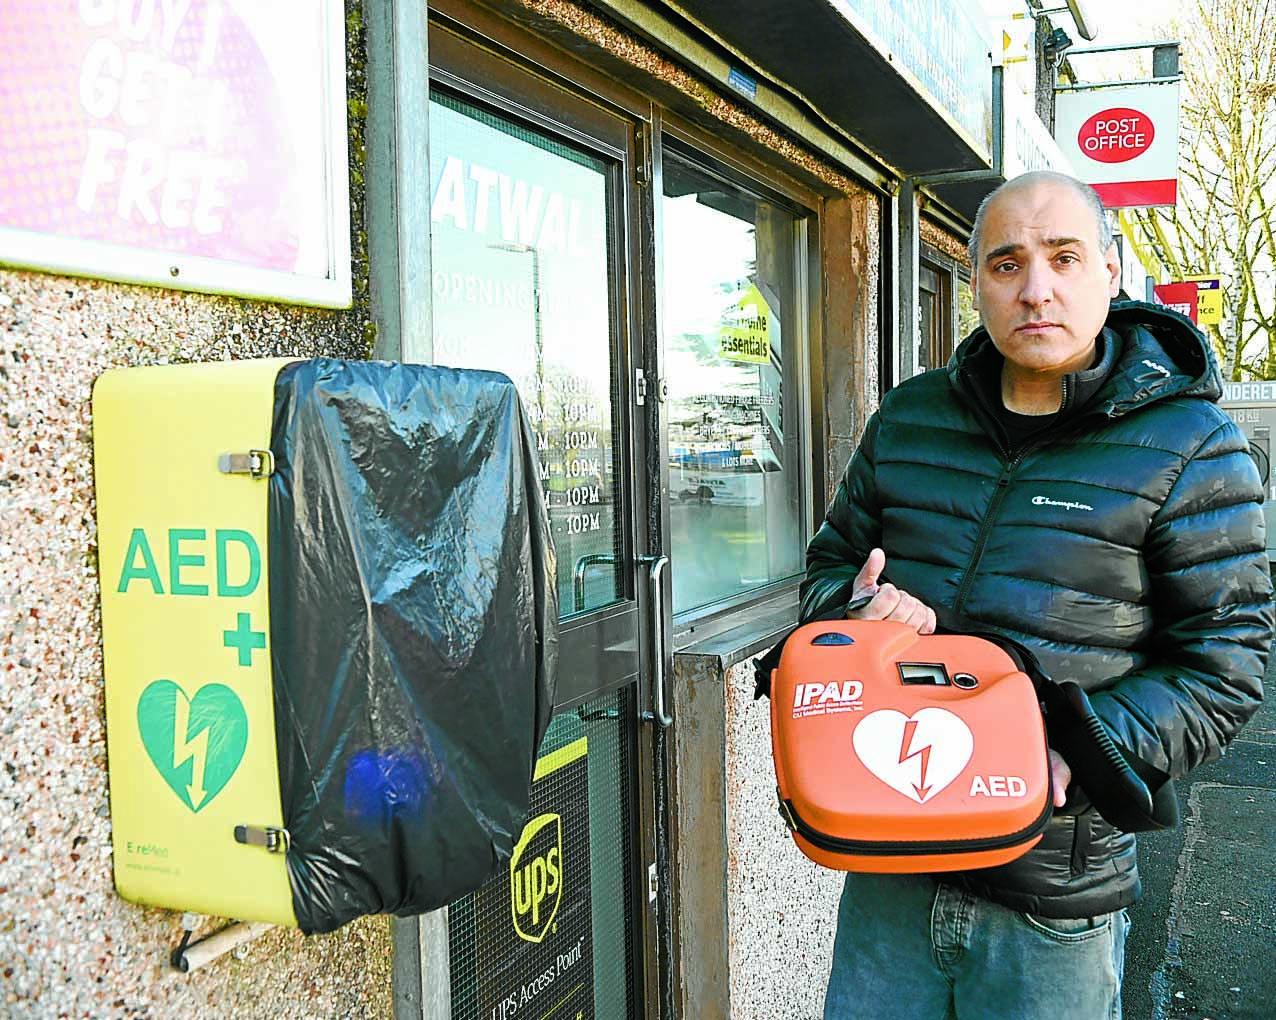 Anger as second defibrillator damaged